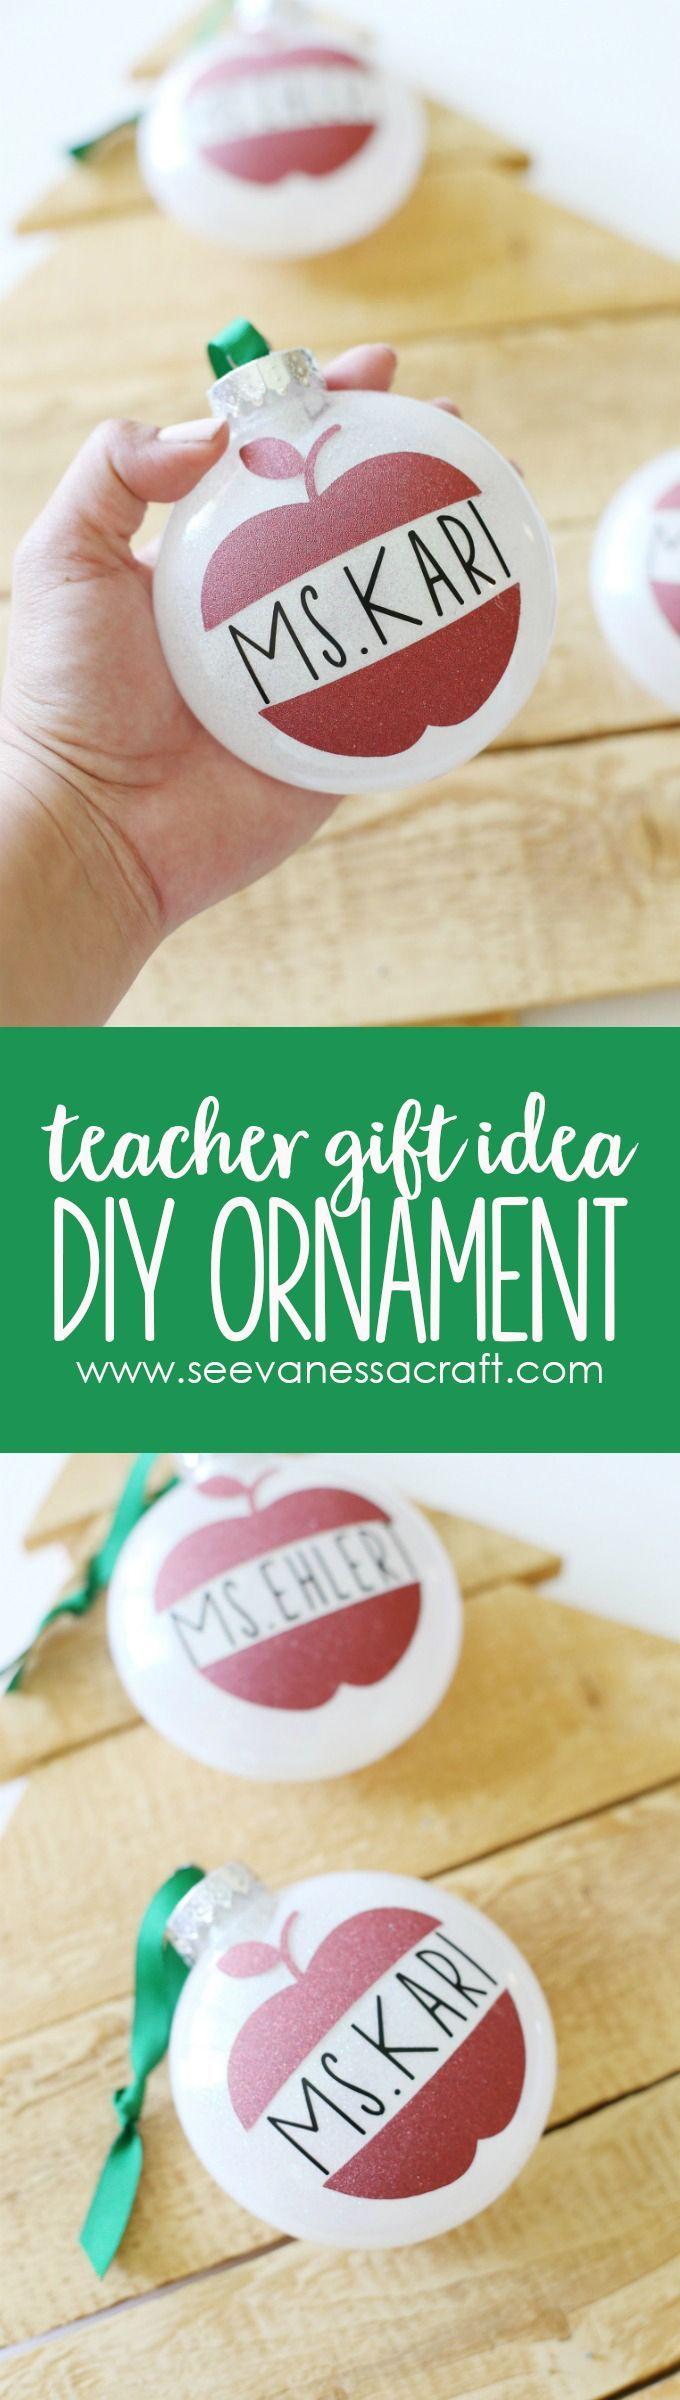 Christmas: Cricut Glitter Vinyl Ornaments Teacher Gift - See Vanessa Craft